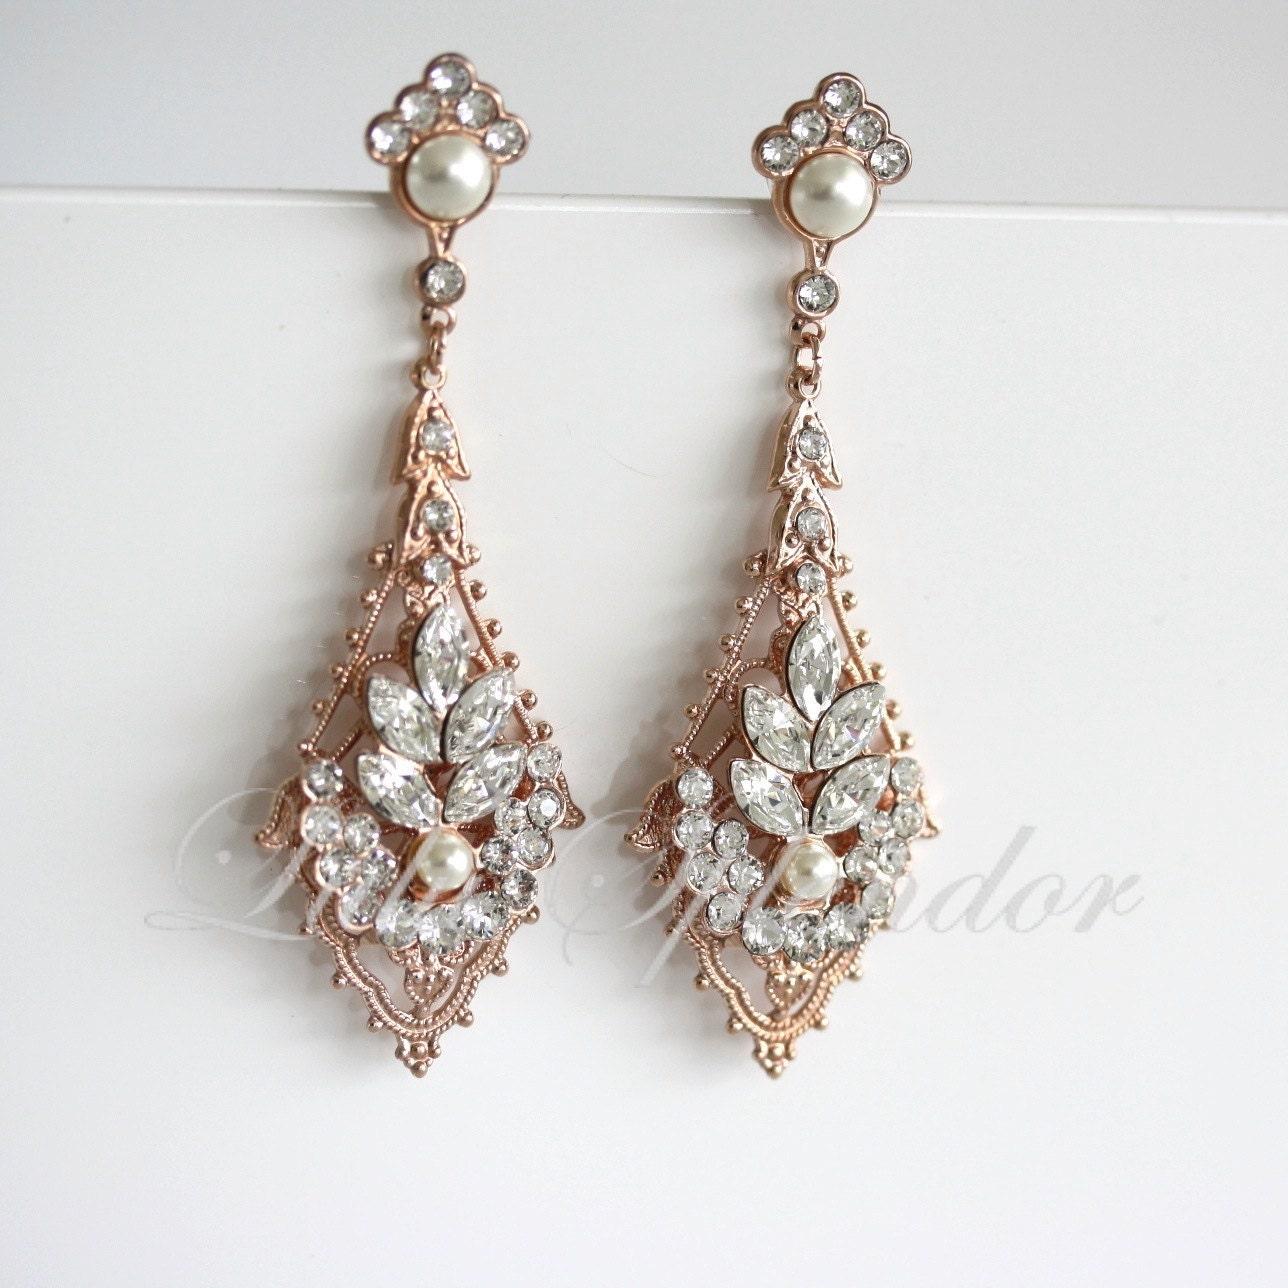 52c612991 Rose Gold Wedding Earrings Chandelier Bridal Earrings | Etsy